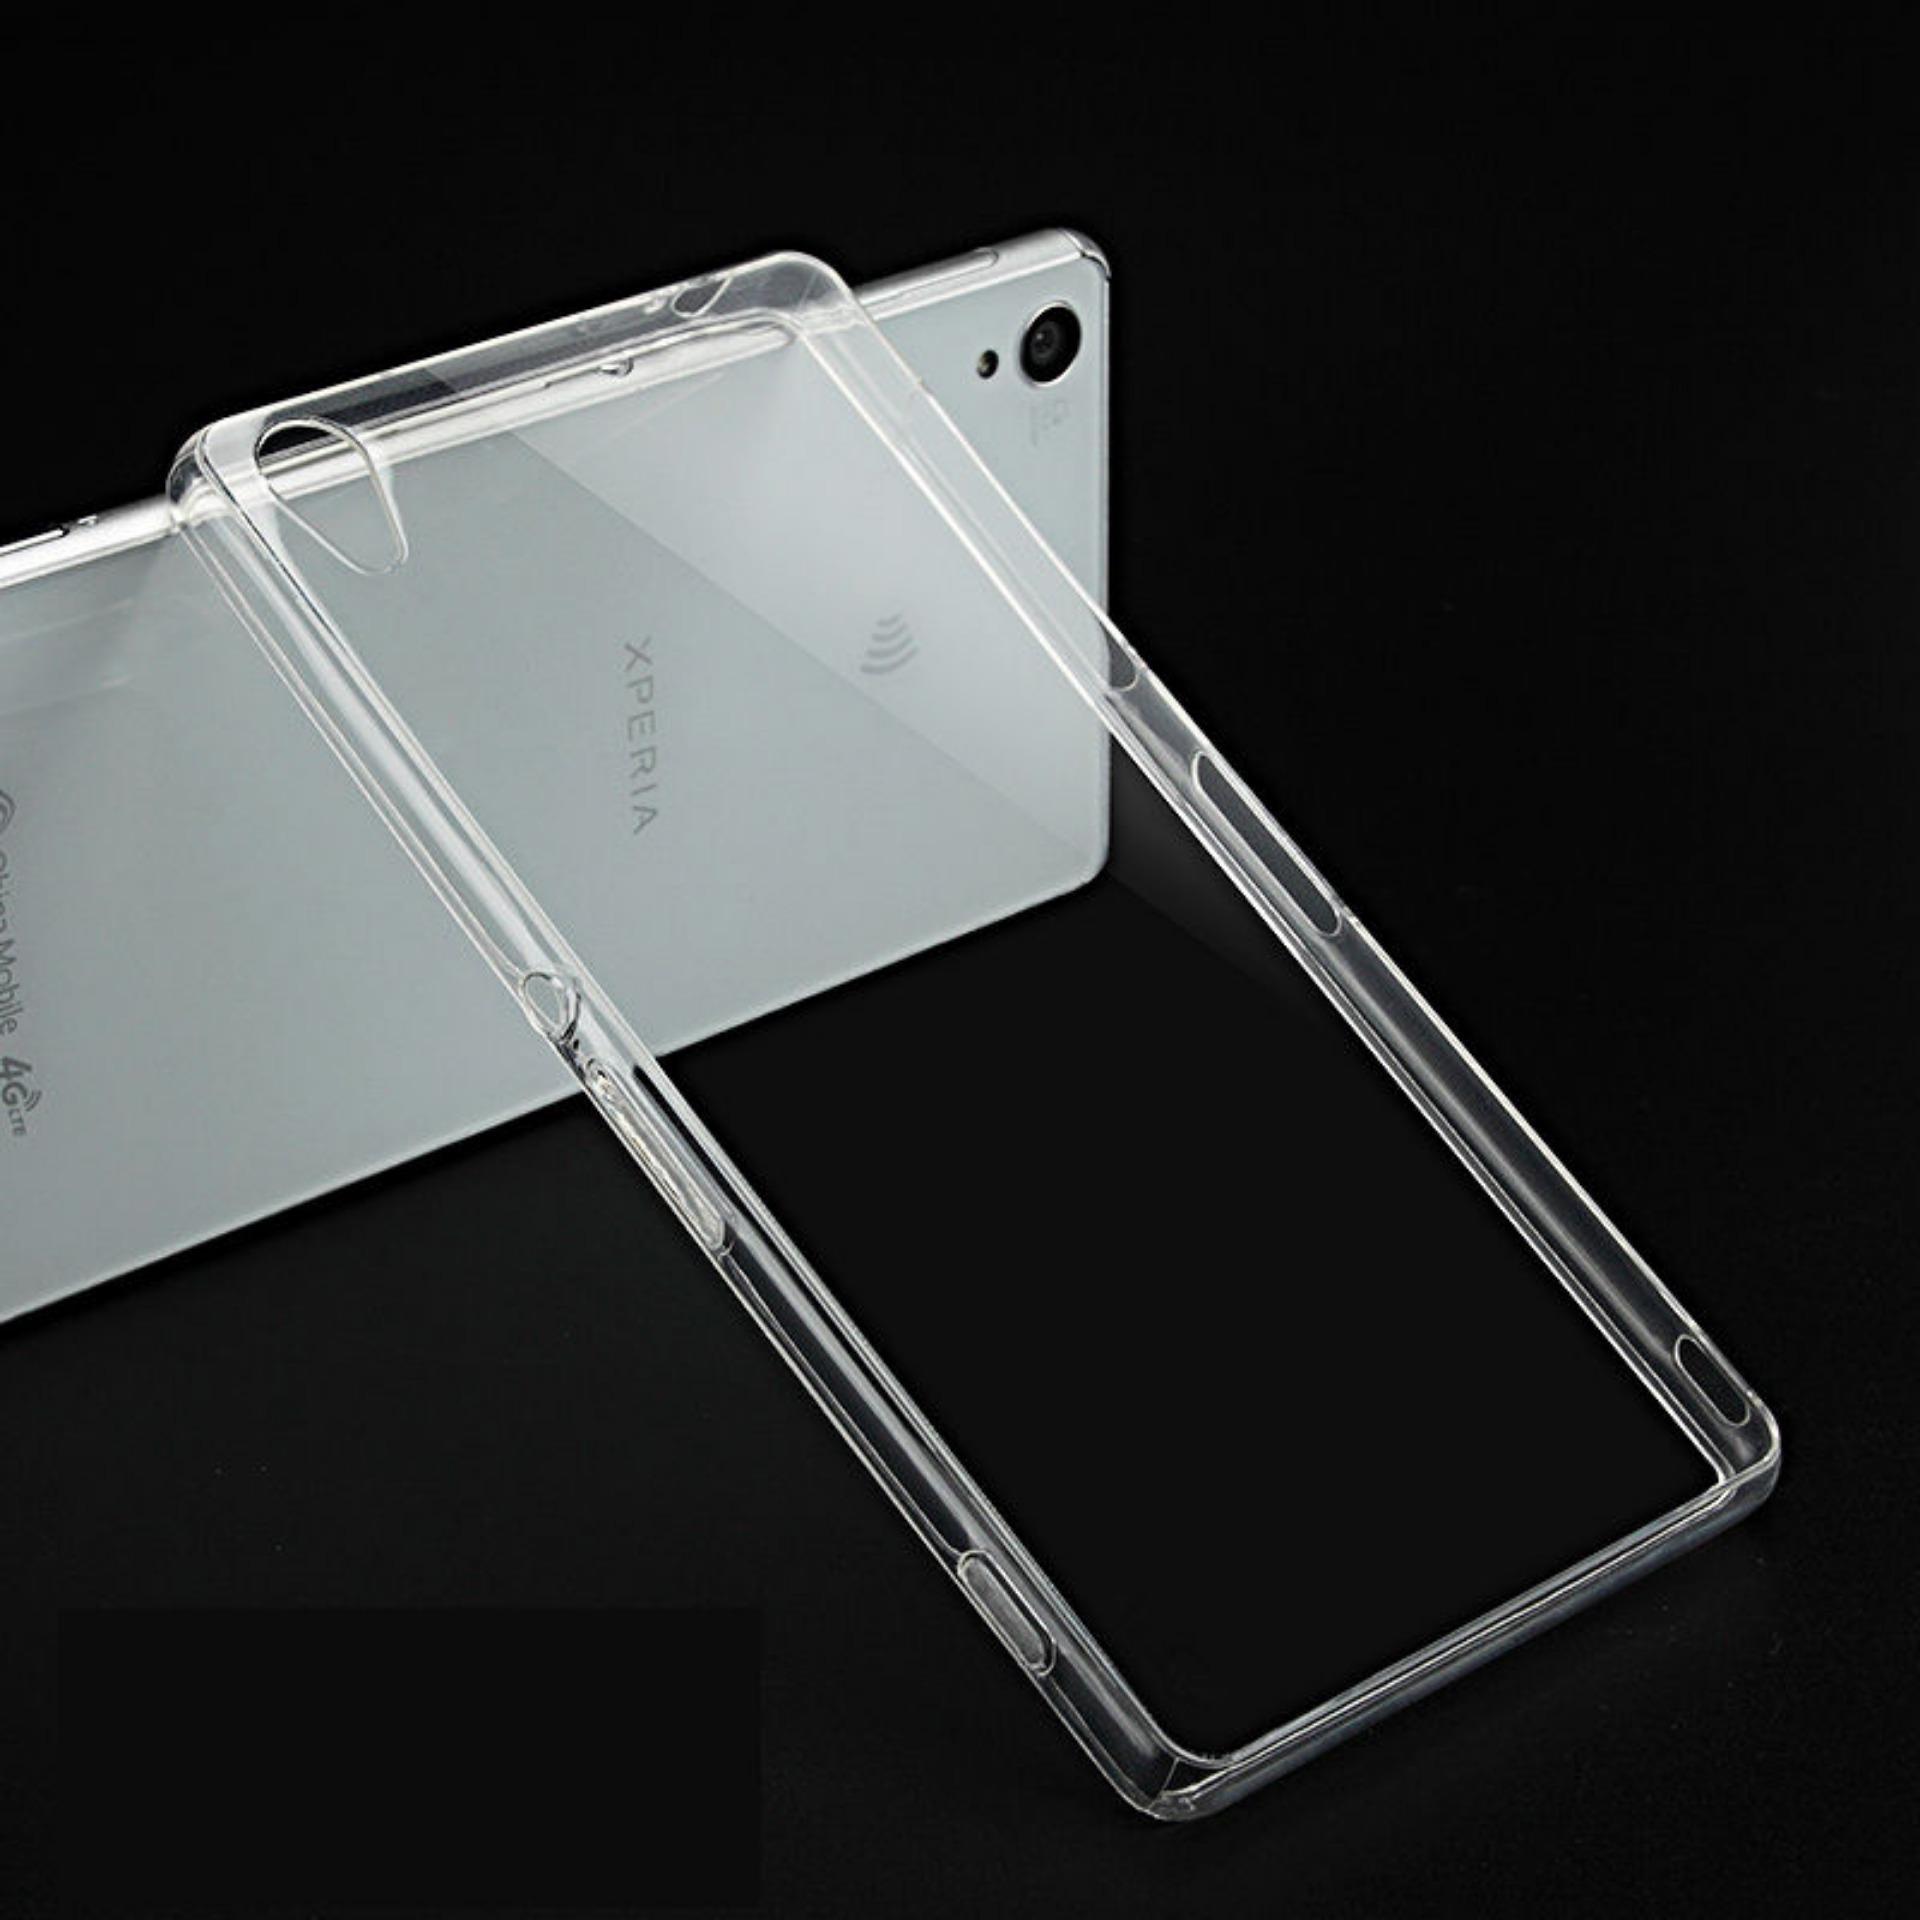 Kehebatan Nillkin Original Nature Apple Iphone 7 8 Clear Silikon Soft Case Lg V20 Ultrathin 06mm Lollypop Tpu Jelly Sony Xperia X Transparant Softcase Silicone Backcase Backcover